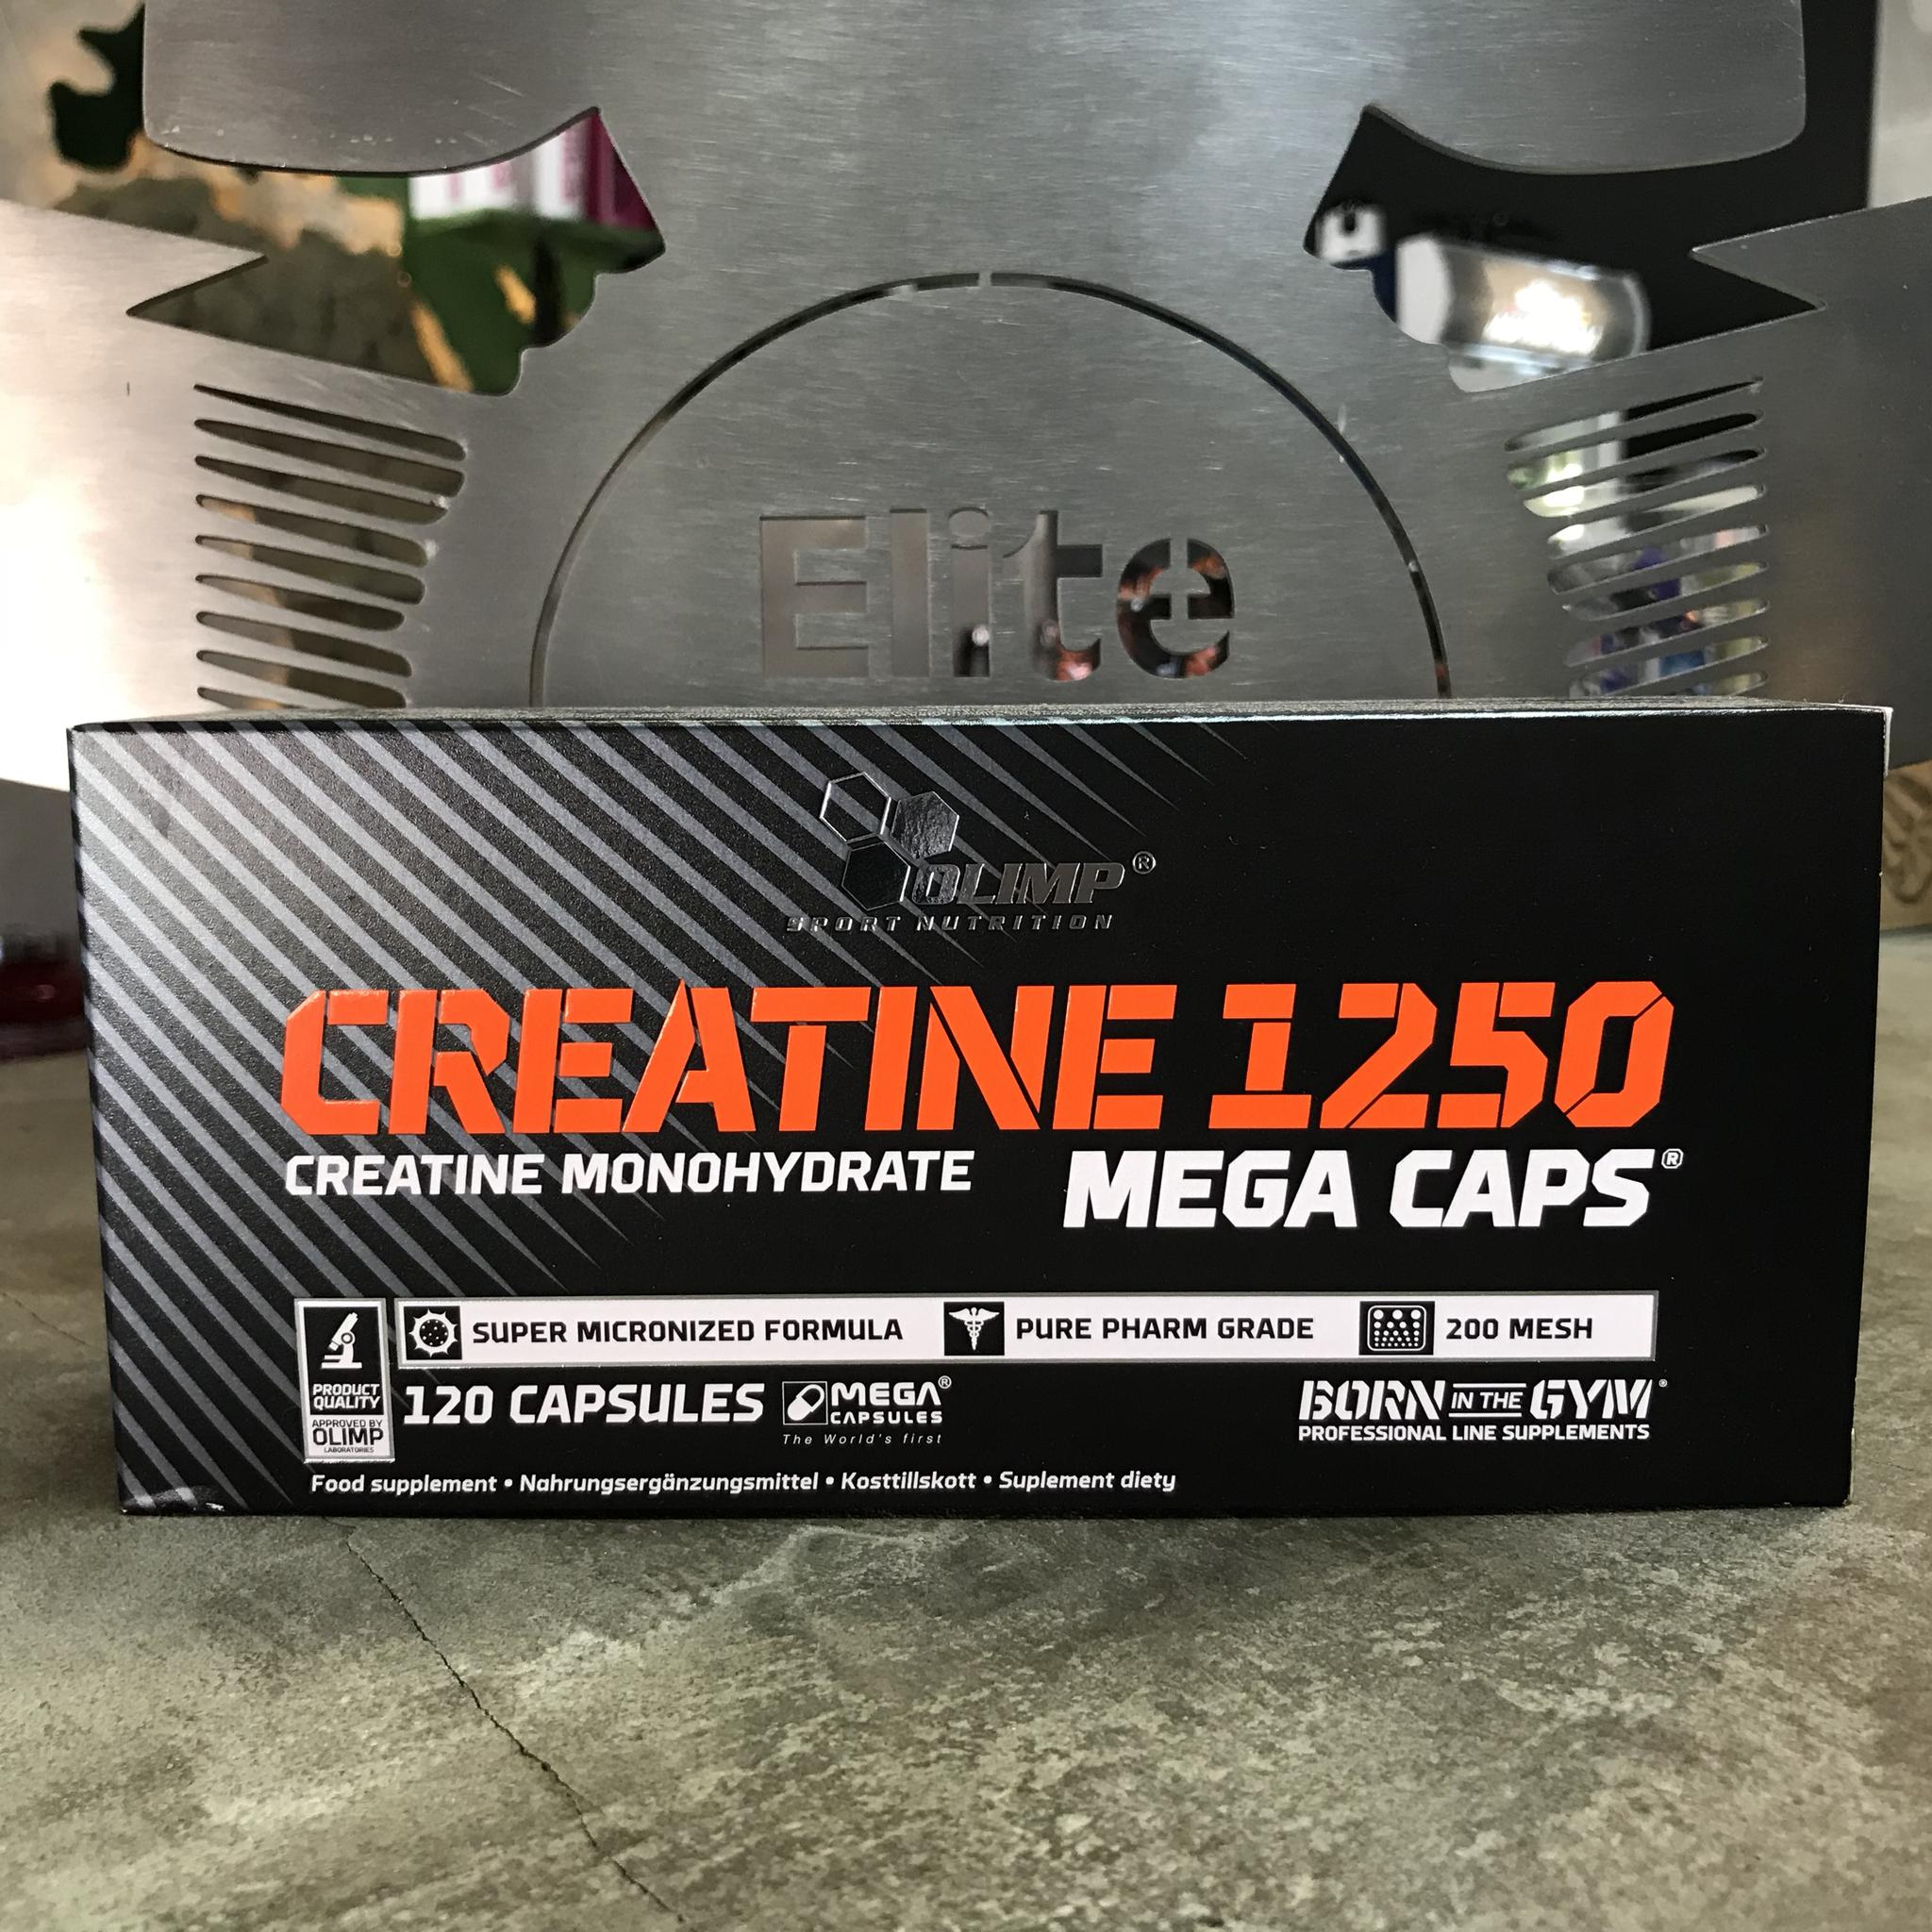 Creatine 1250 Mega Caps    jetzt minus 40%!!! 00025